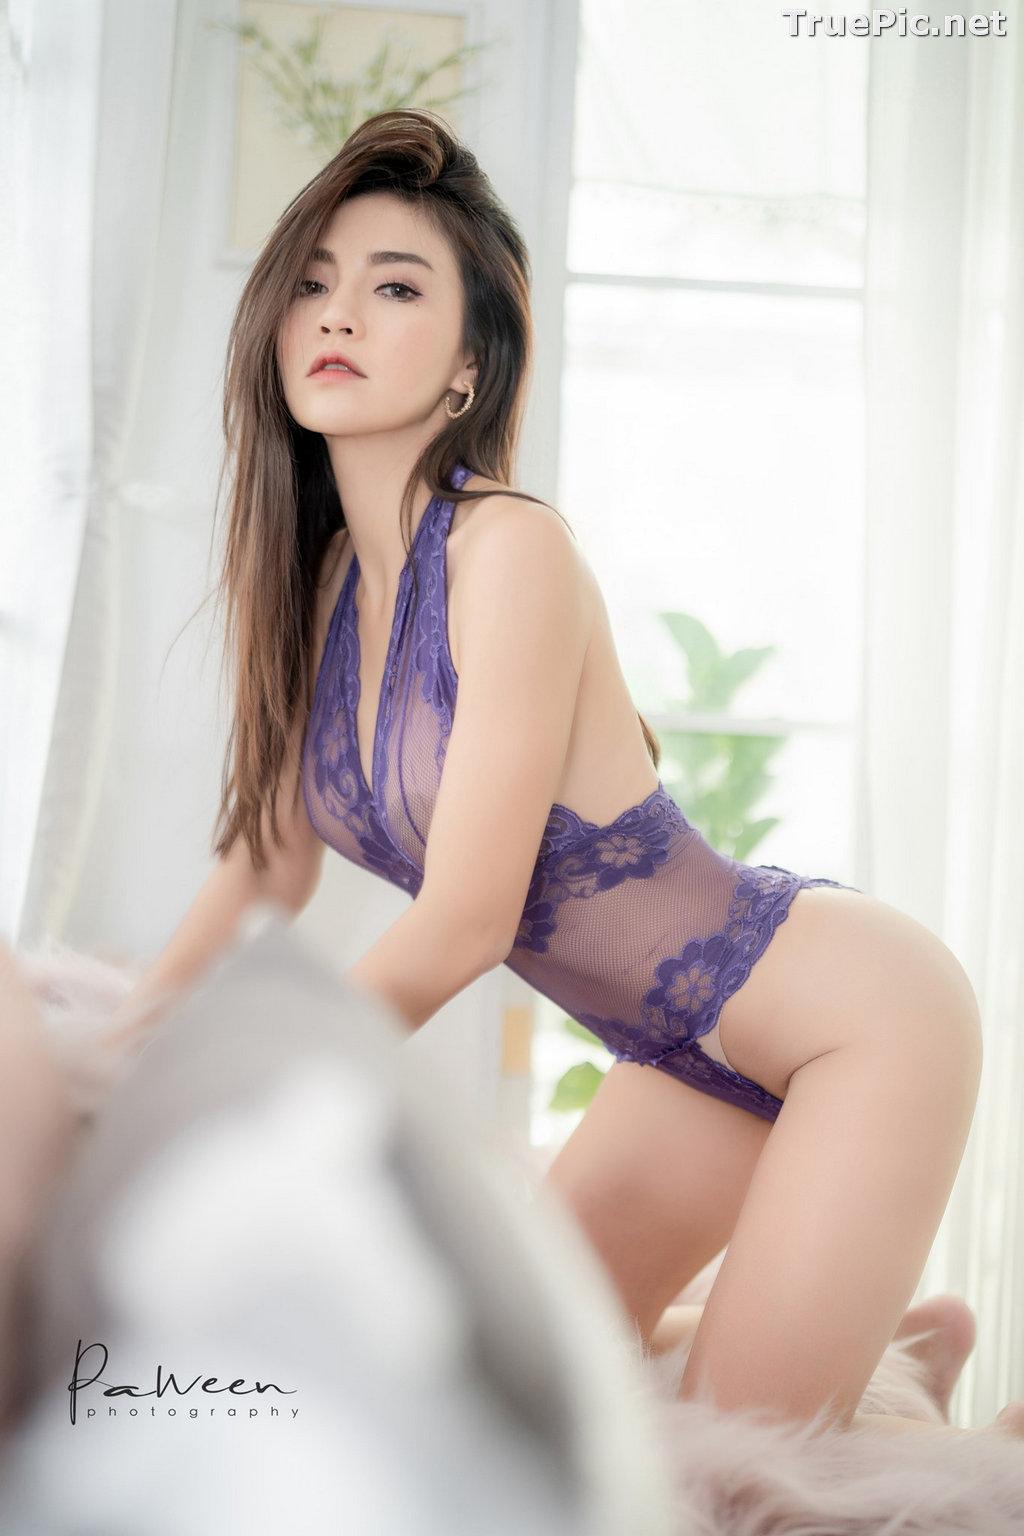 Image Thailand Model - Ladapa Ratchataamonchot - Sexy Garden - TruePic.net - Picture-3